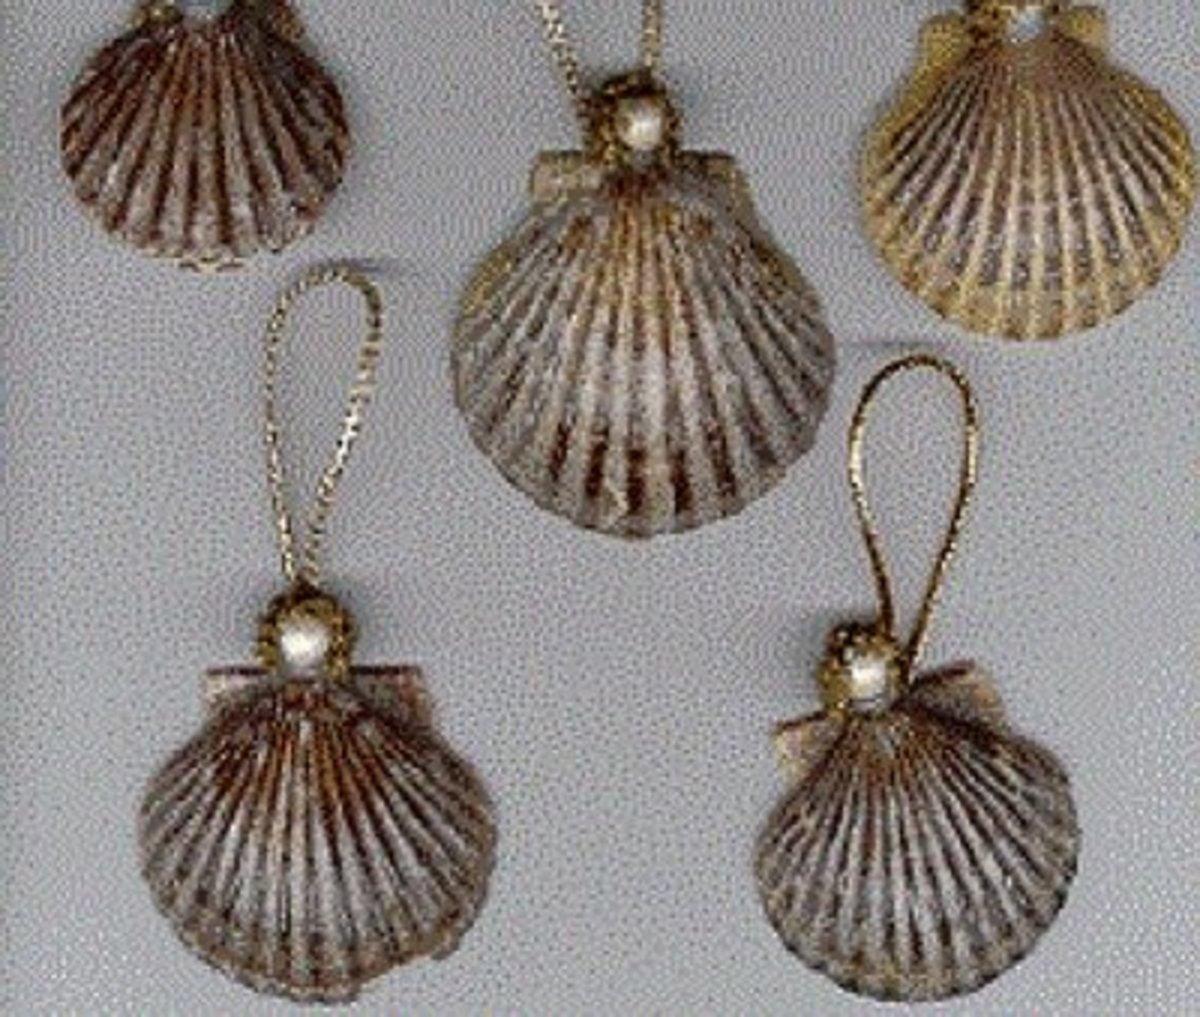 39 Unique Sea Glass And Seashell Craft Ideas Feltmagnet